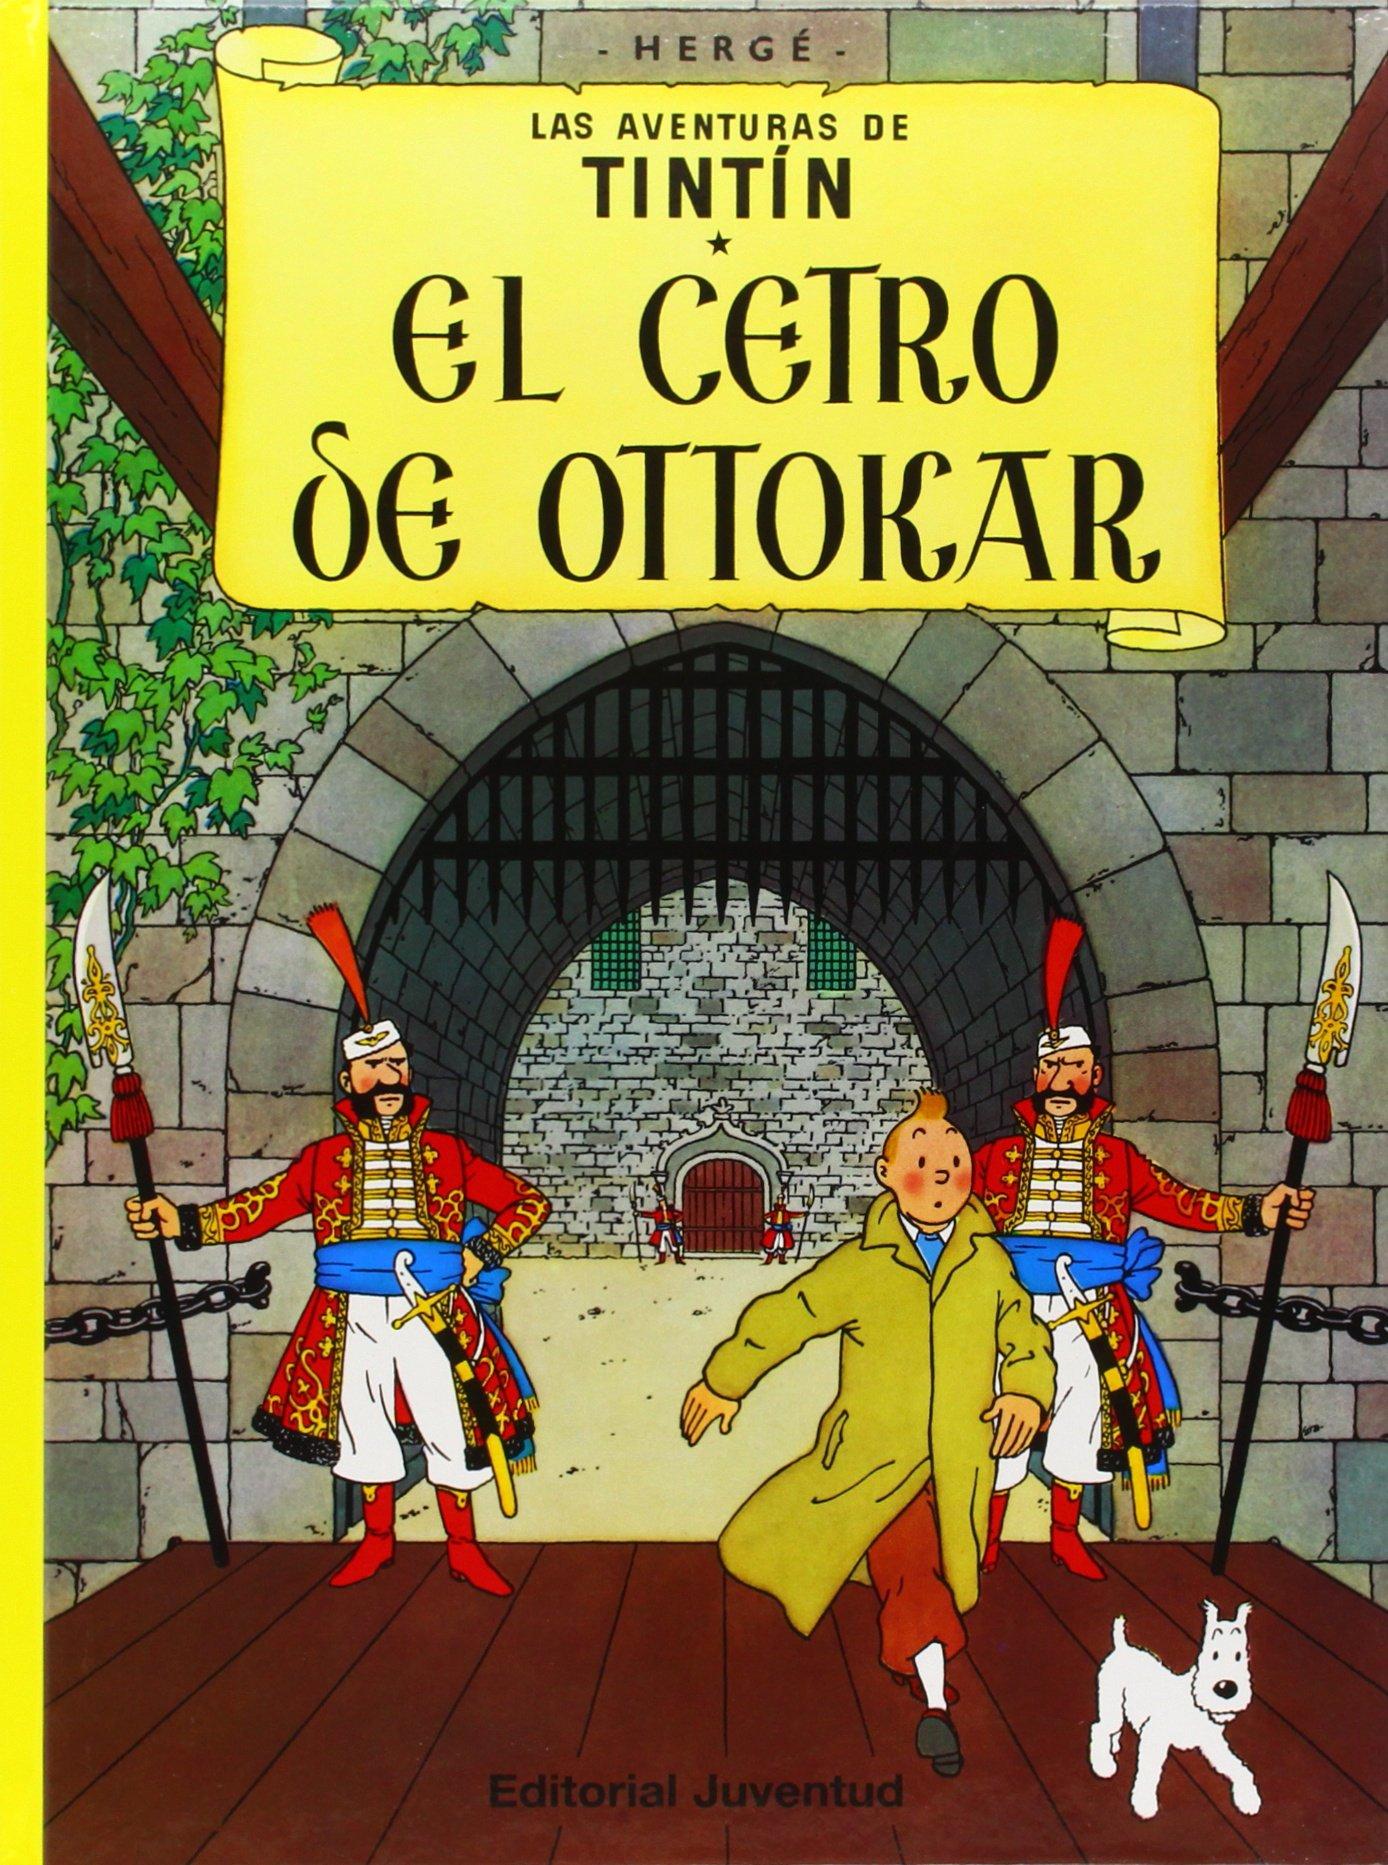 El cetro de Ottokar / King Ottokar's Scepter (Las aventuras de Tintin) (Spanish Edition)